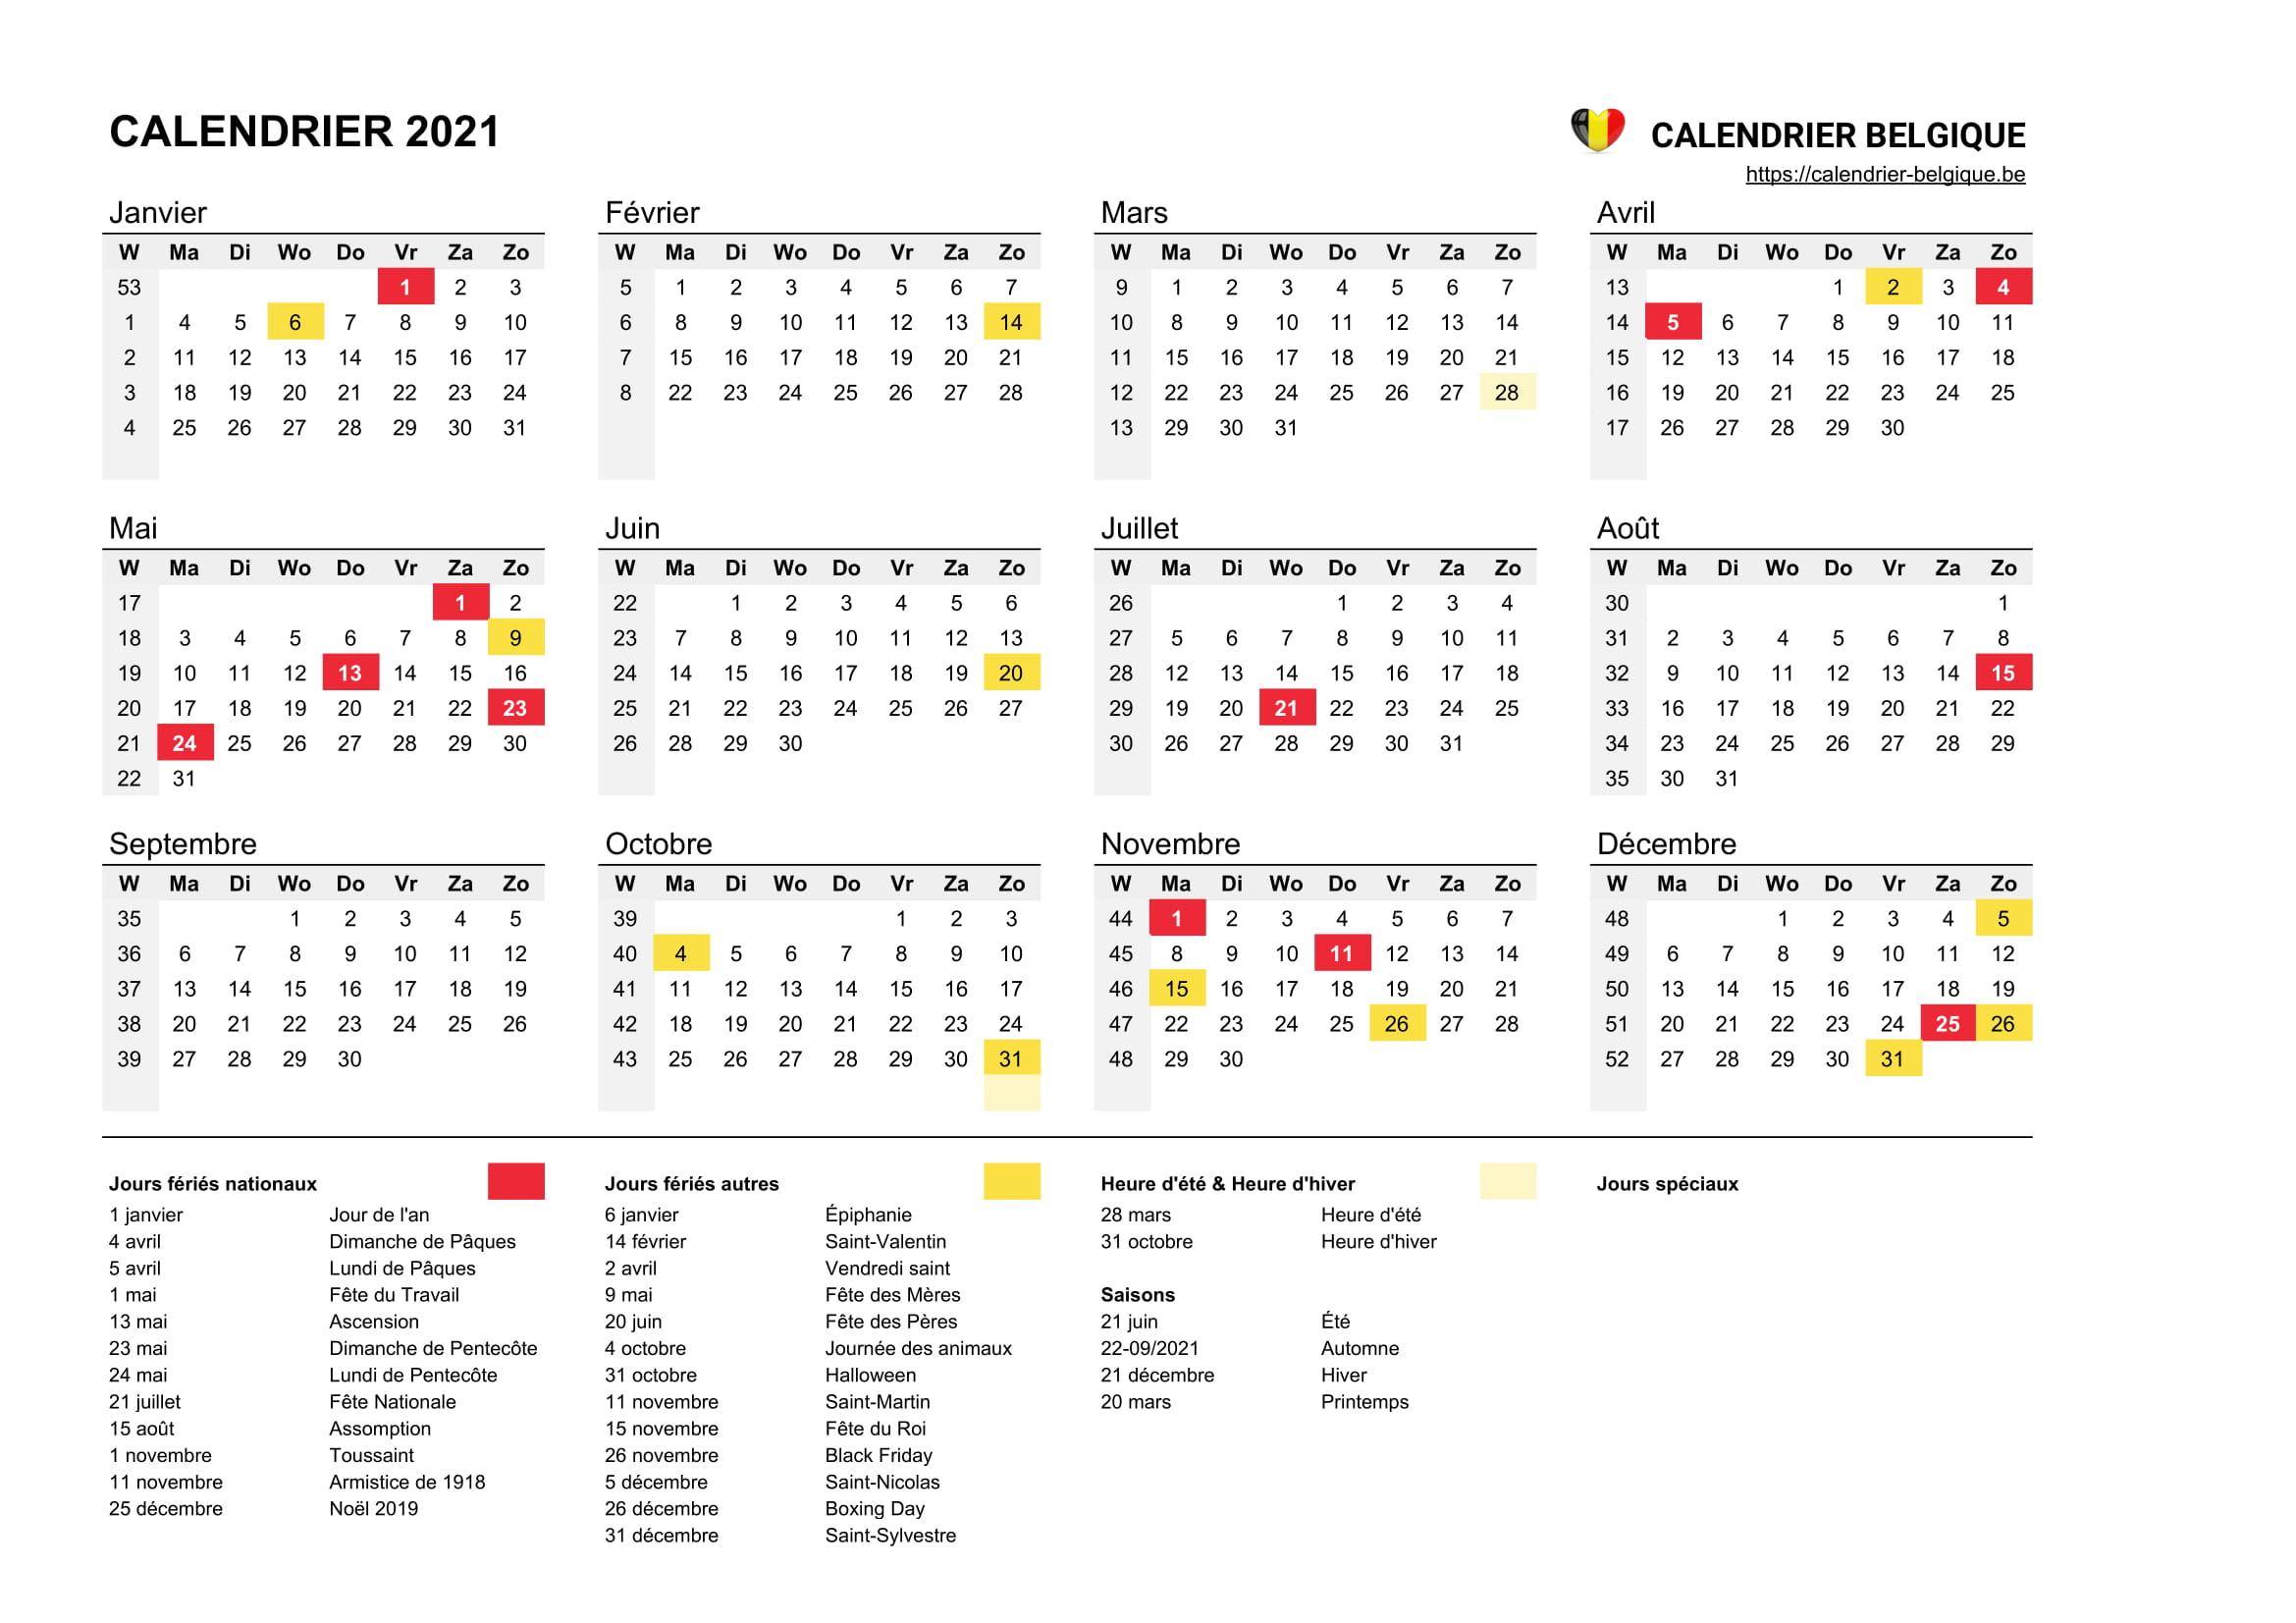 Calendrier 2021 Ascension Calendrier 2021 • Calendrier Belgique